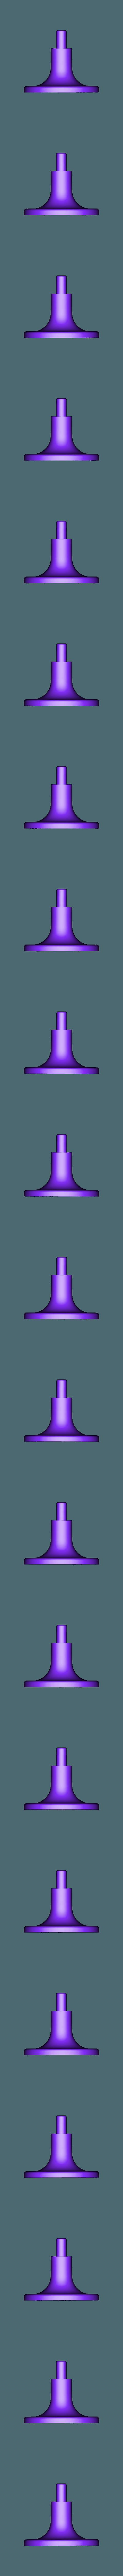 R8 Stand.stl Download STL file R8 Collet Spinning Holder • Design to 3D print, GForceFX